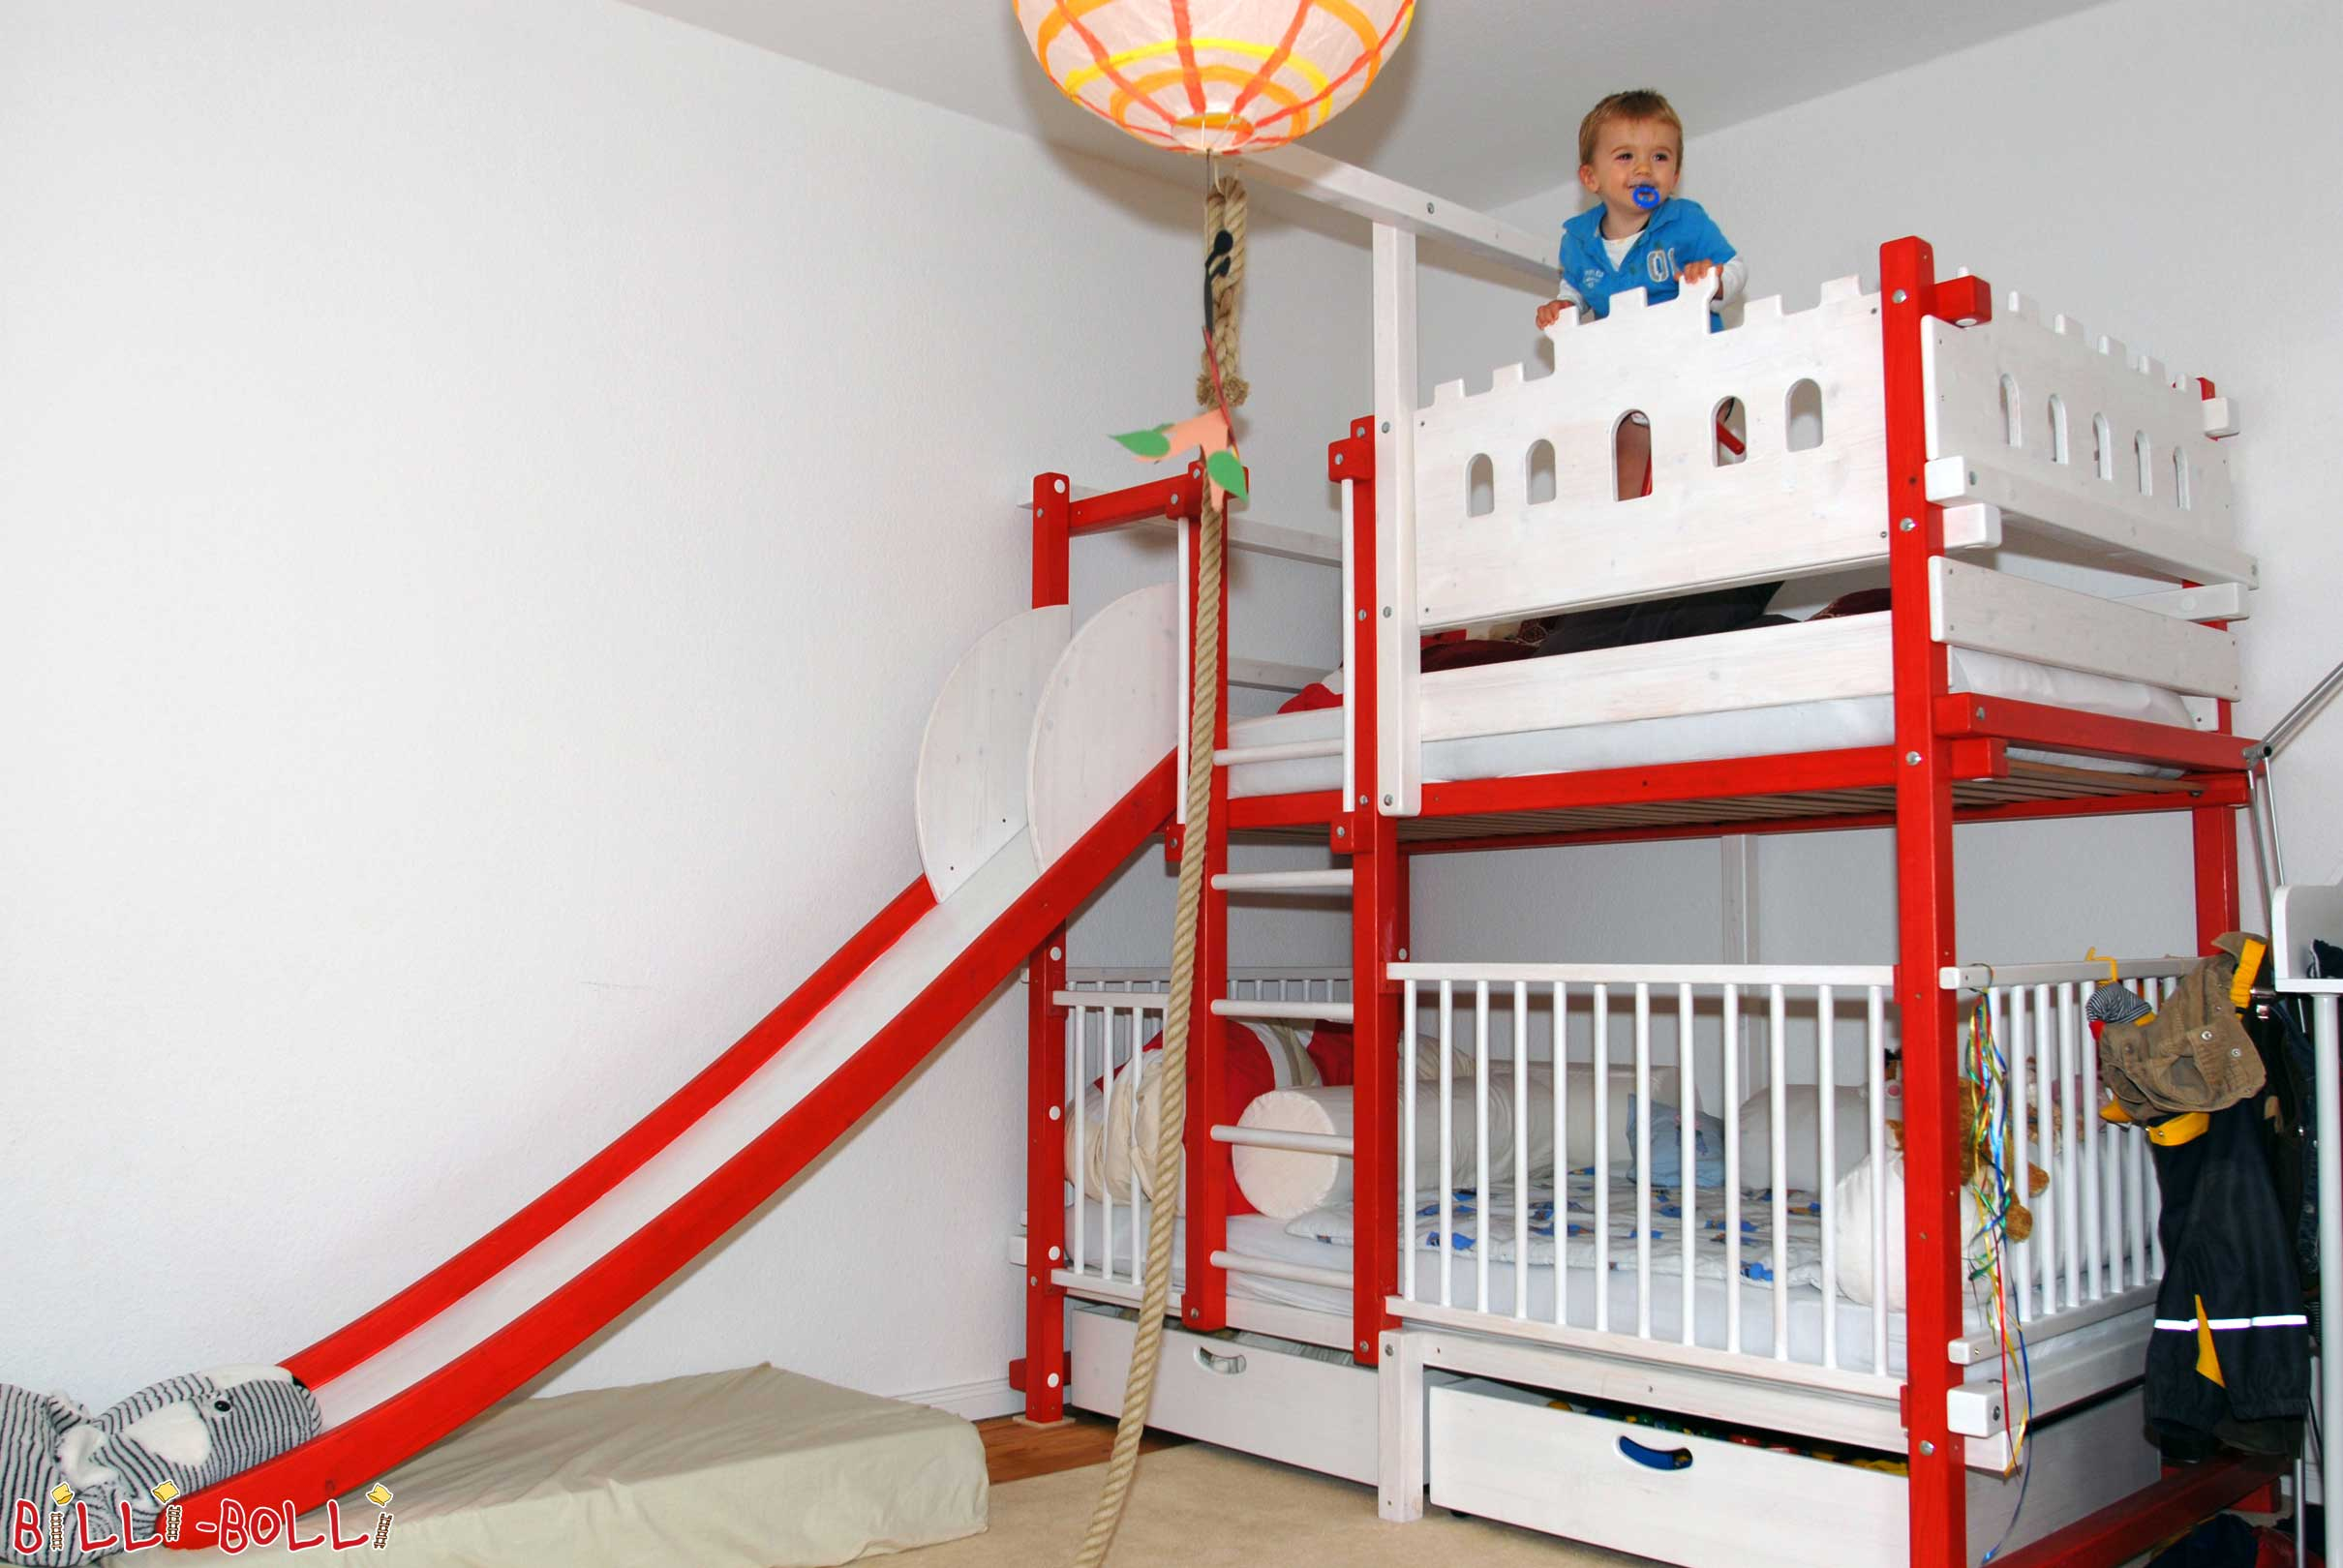 Etagenbett Unten Gitter : Hochbett kinderbett etagenbett babybett abenteuerbett hochbetten